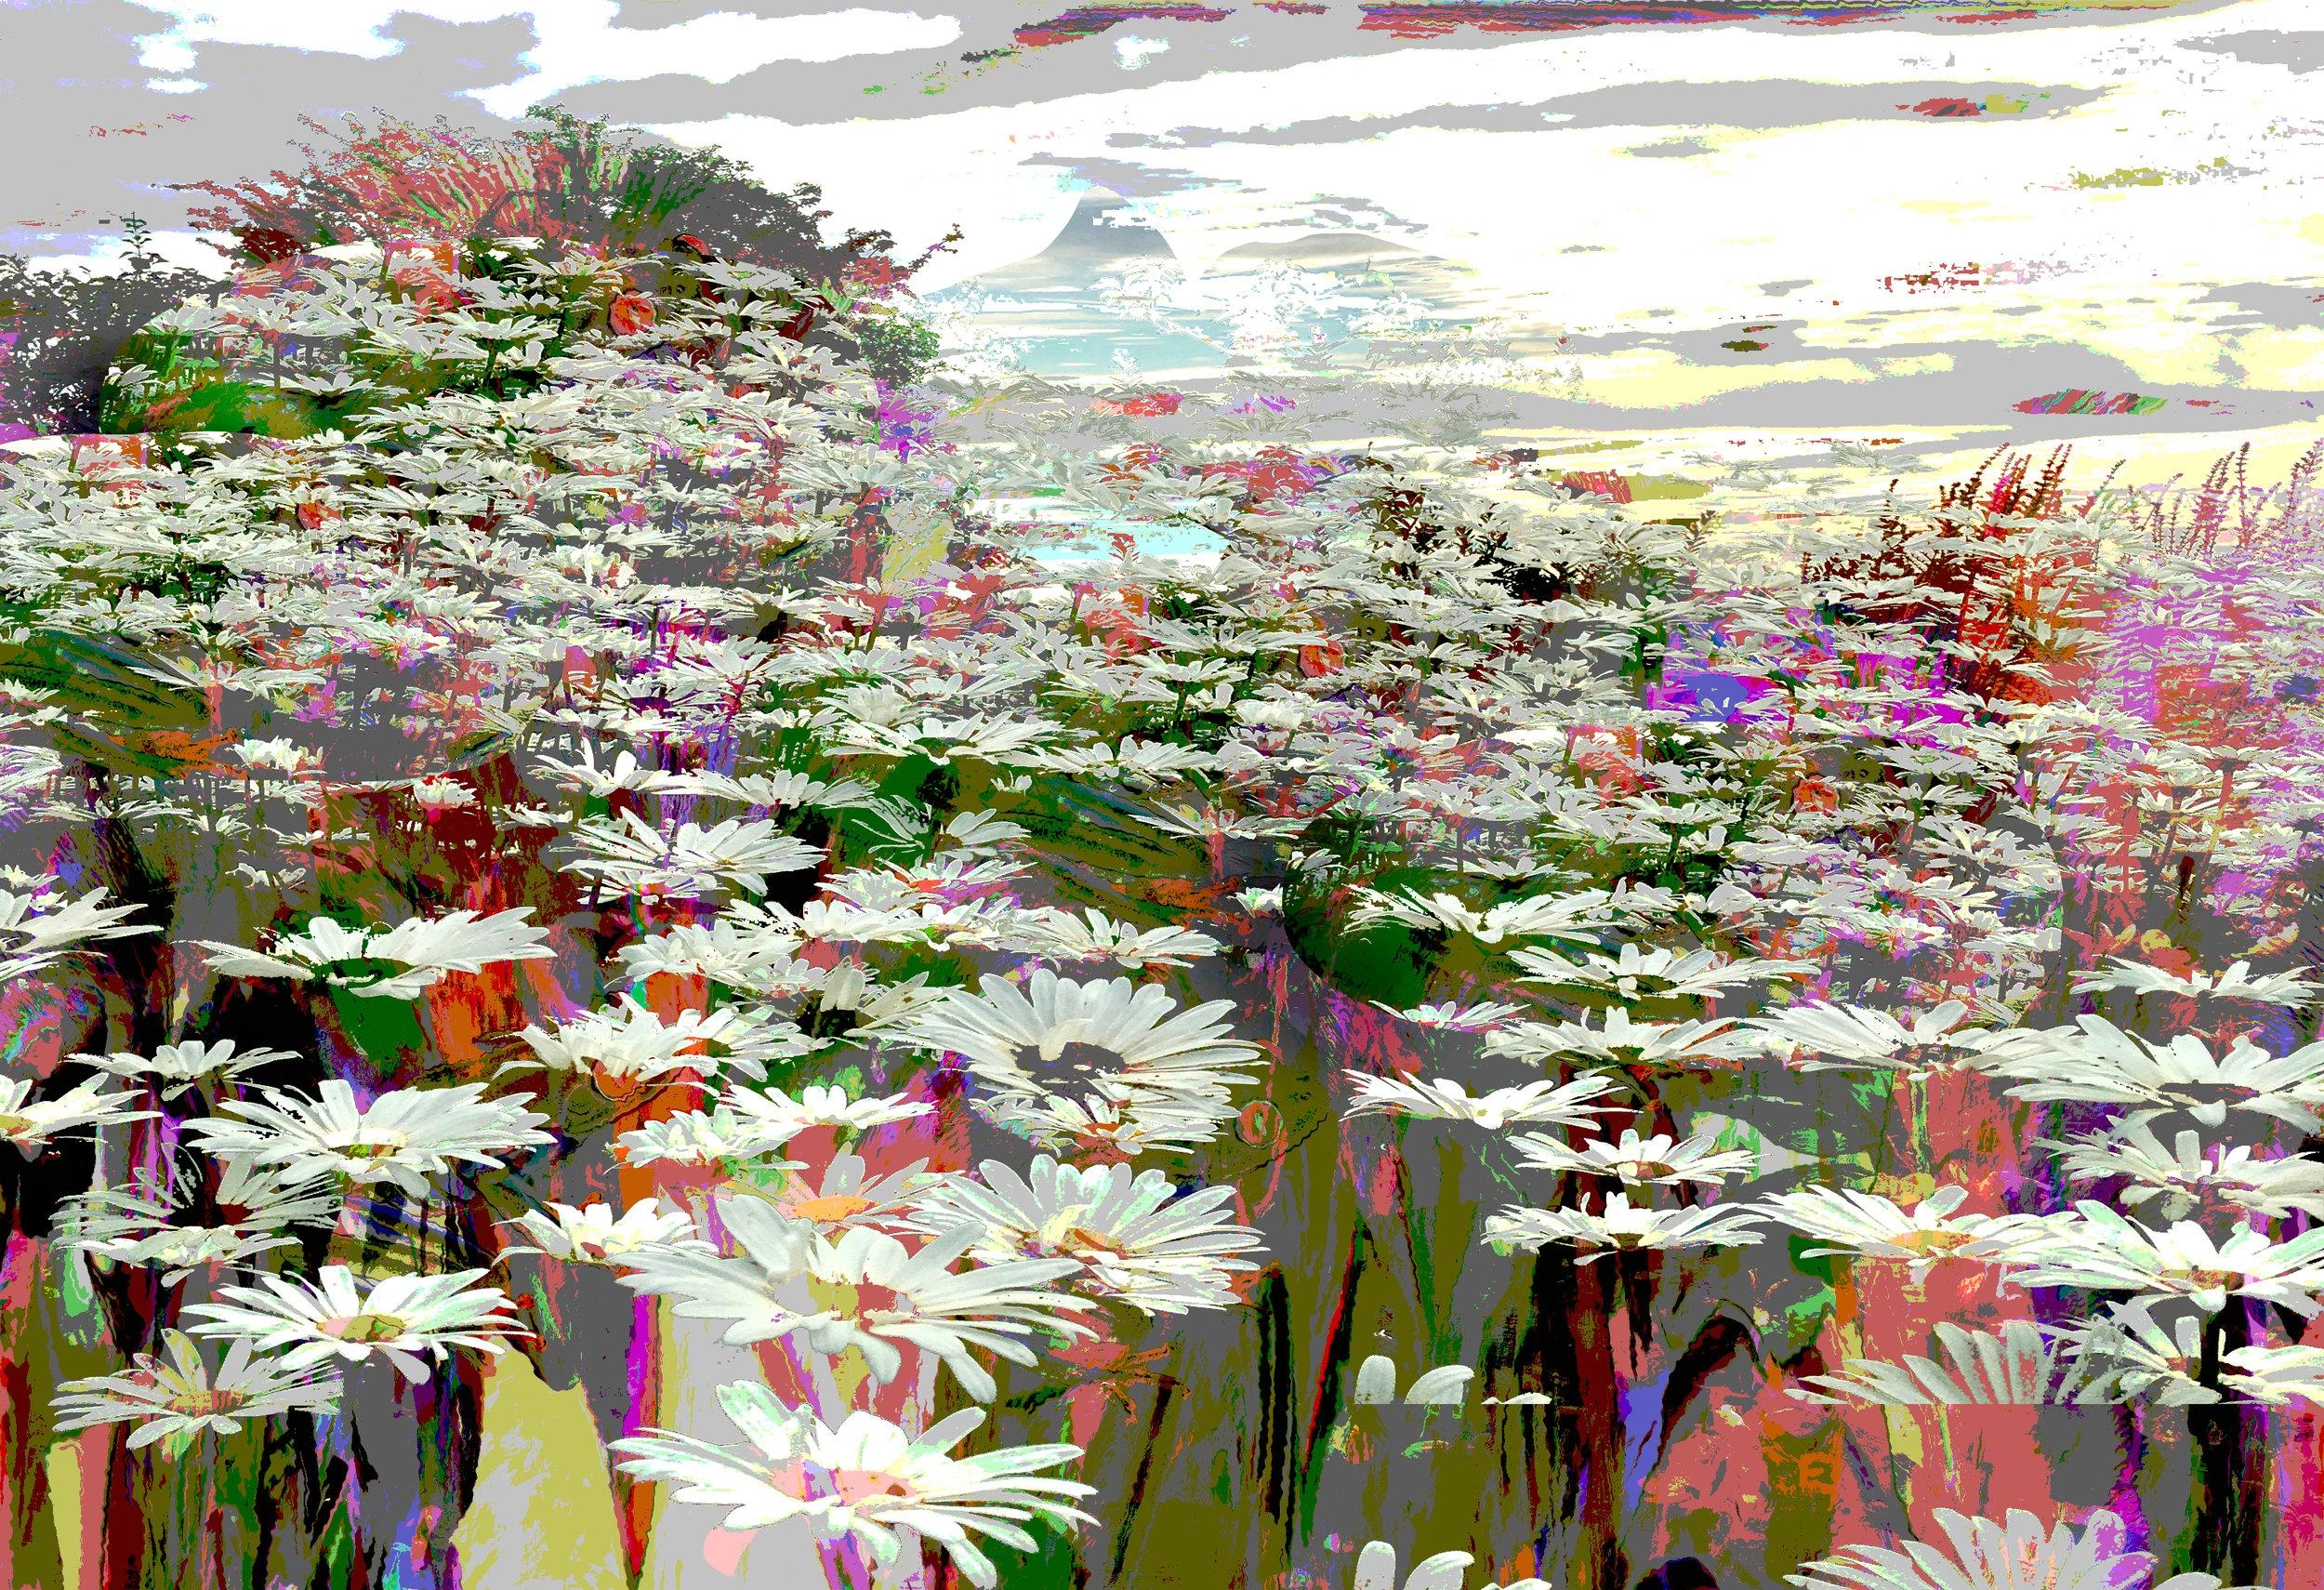 Field of daises.jpg